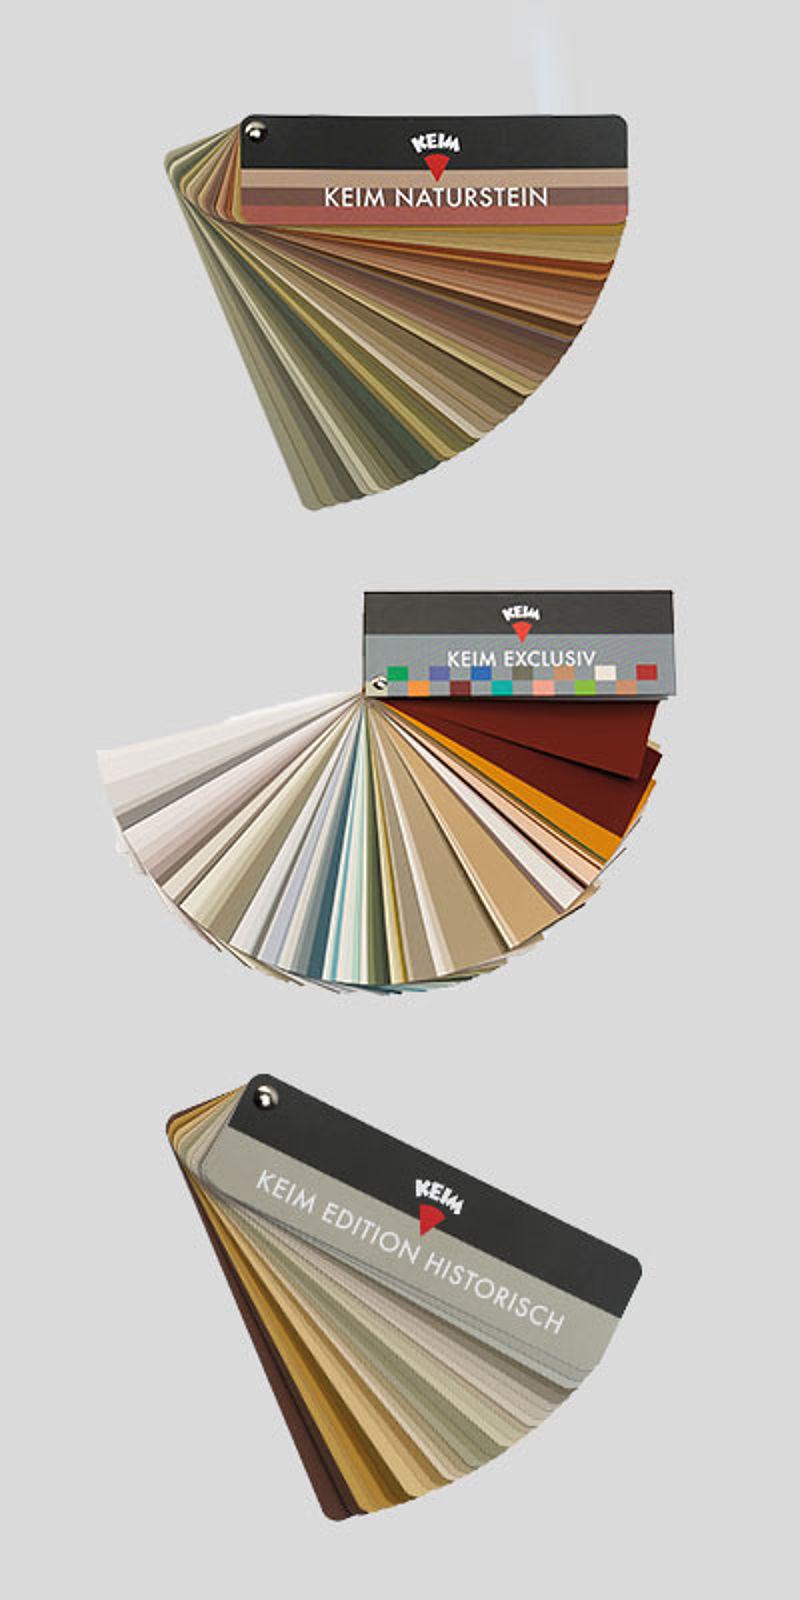 Keim Farbkarten Farbkarten Farben Karten